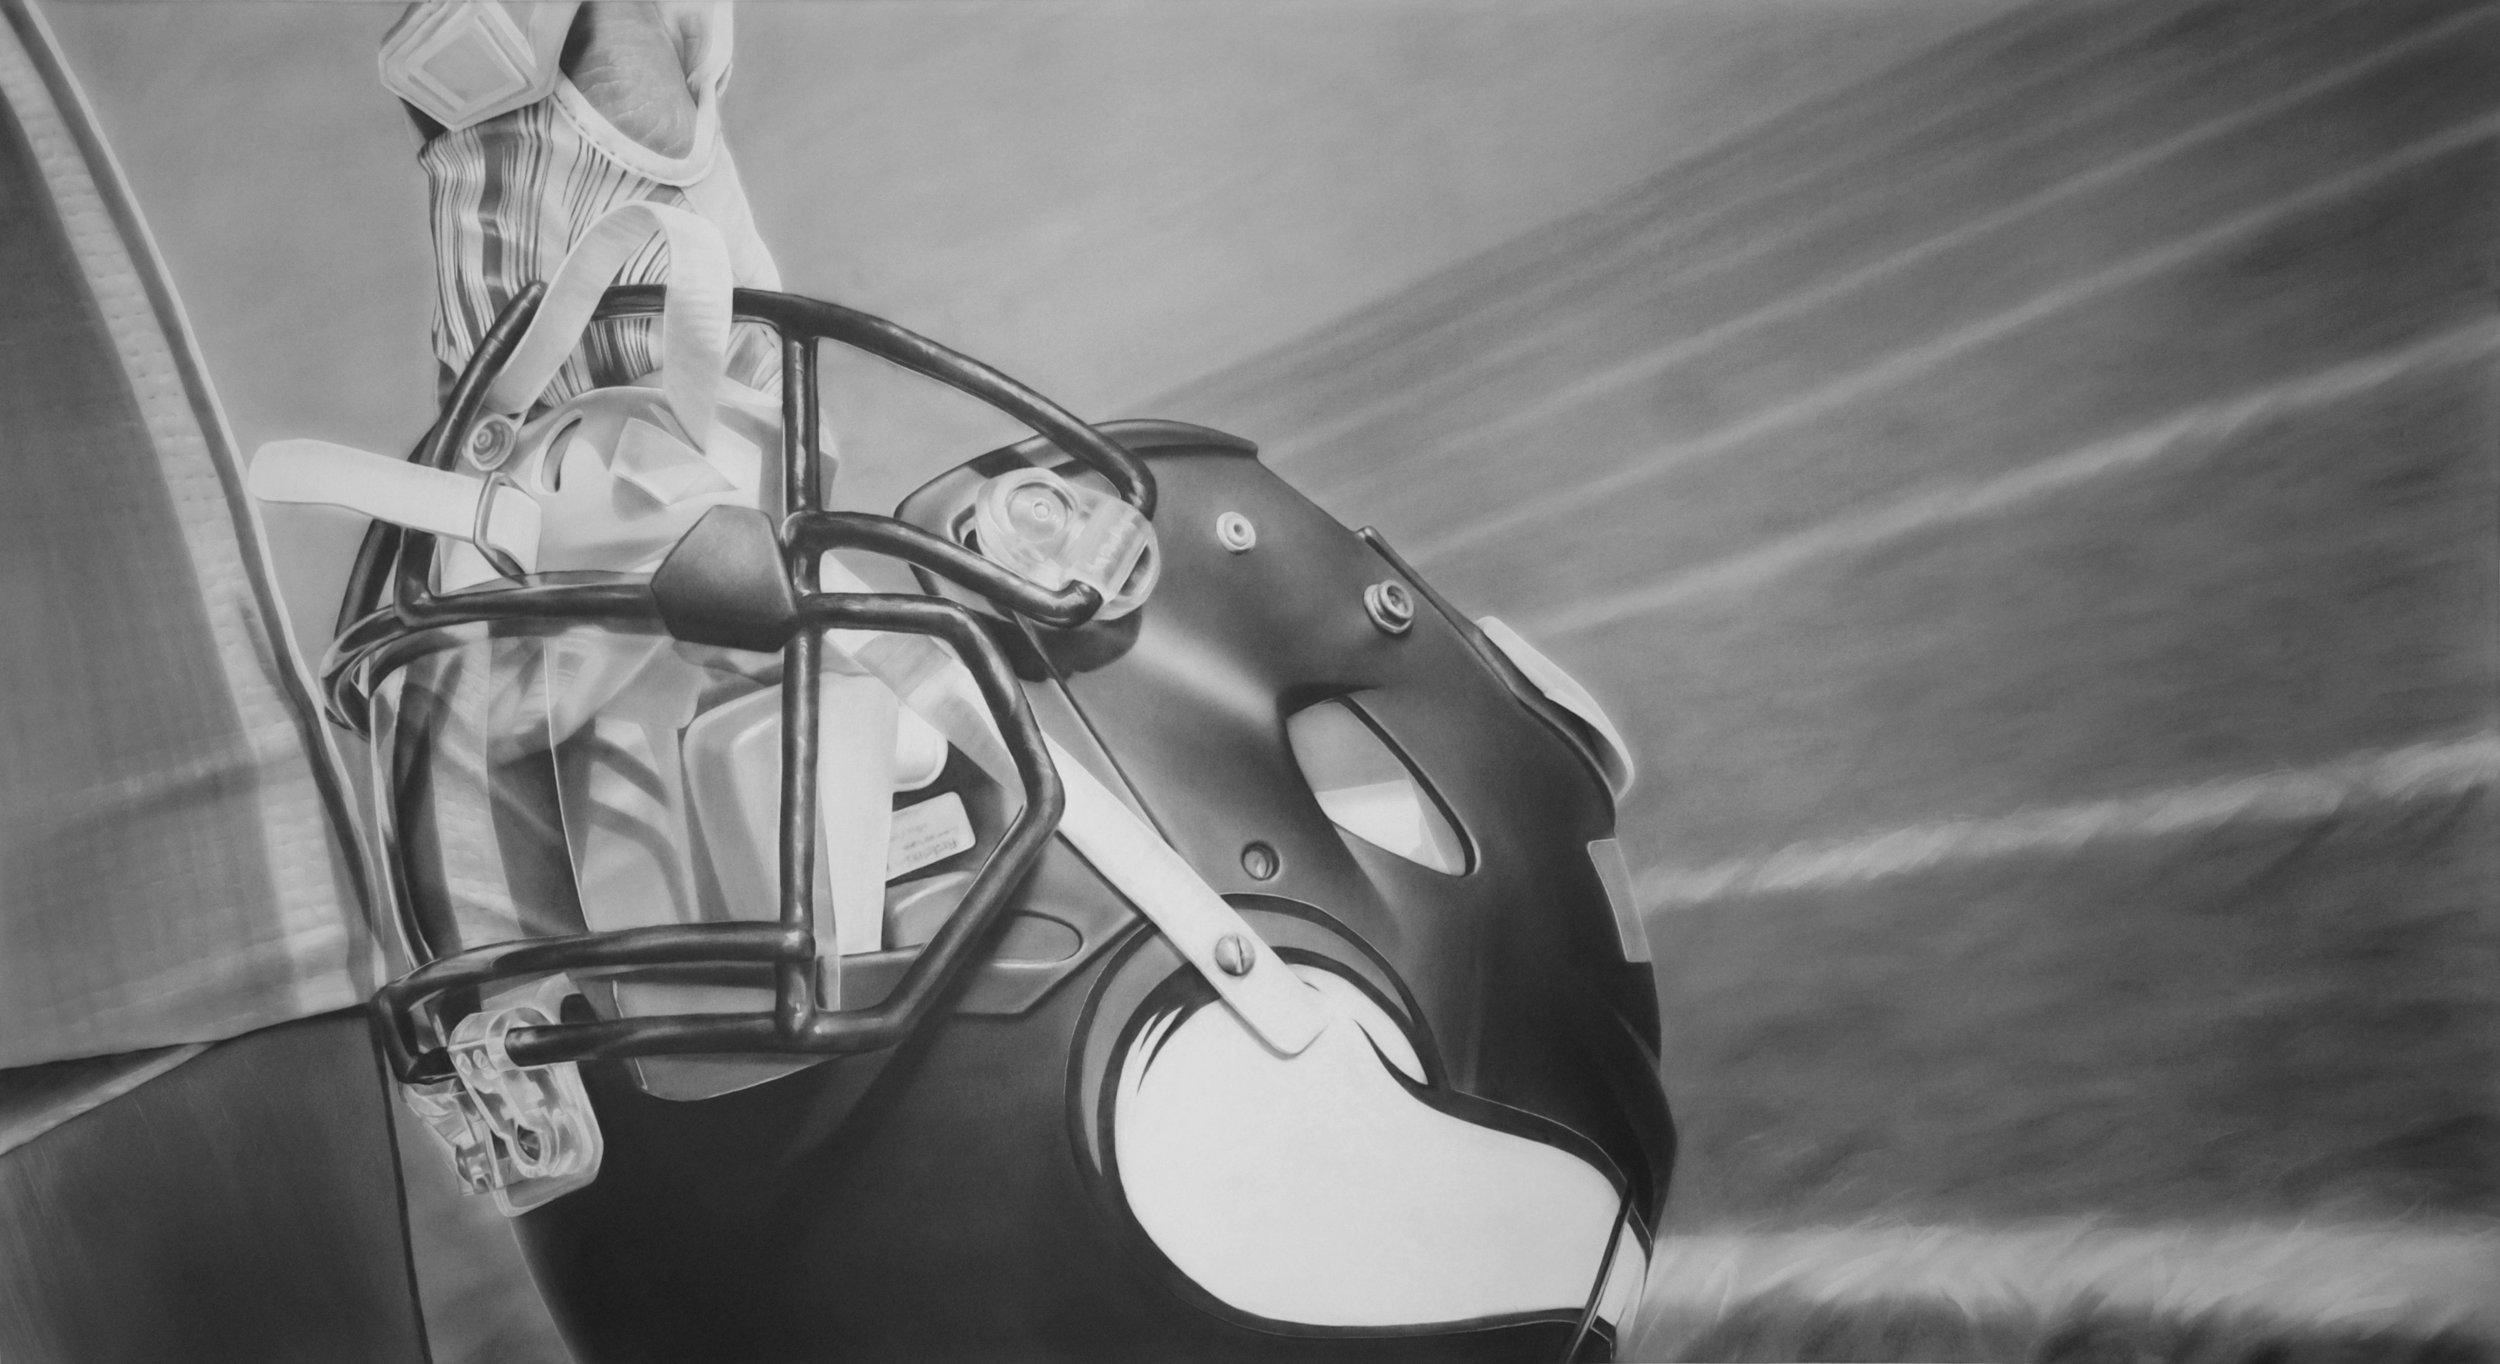 Gjallarhorn (Skol), Graphite on paper, 50 x 90 inches. Commission for the Minnesota Vikings US Bank Stadium. 2016.